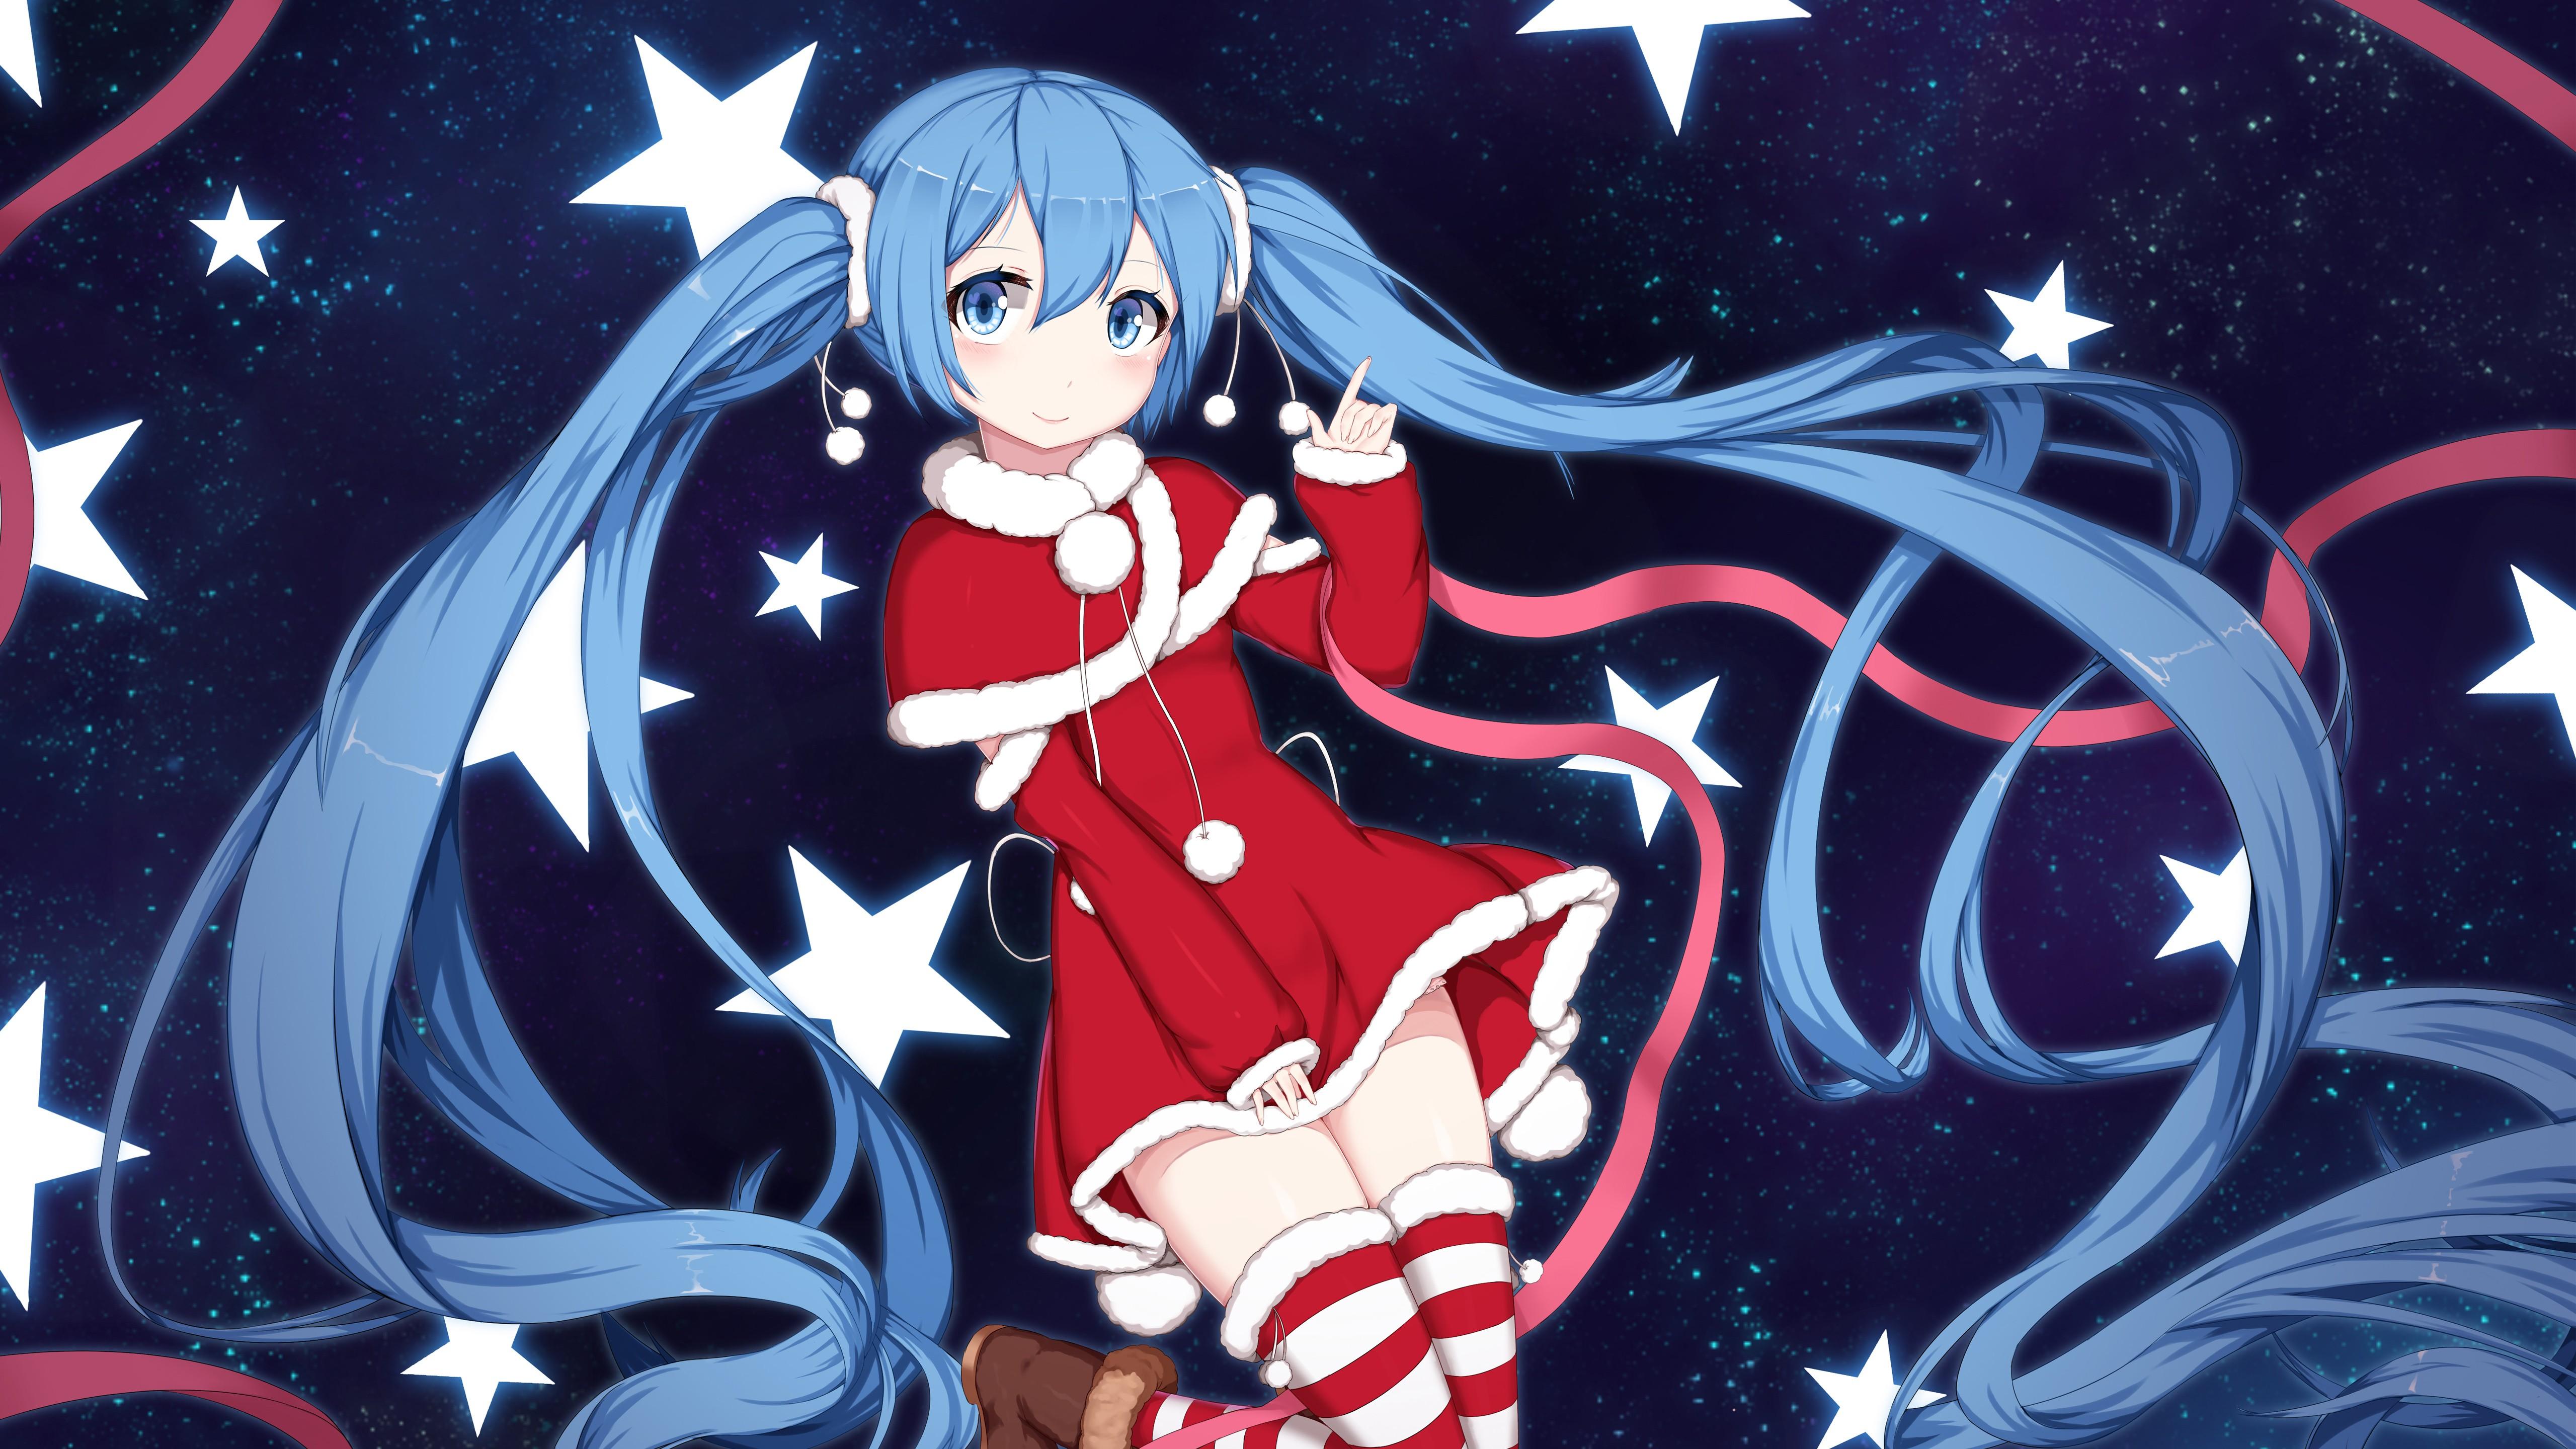 Asuna Android Cute Wallpaper Vocaloid Hatsune Miku Santa Wallpapers Hd Wallpapers